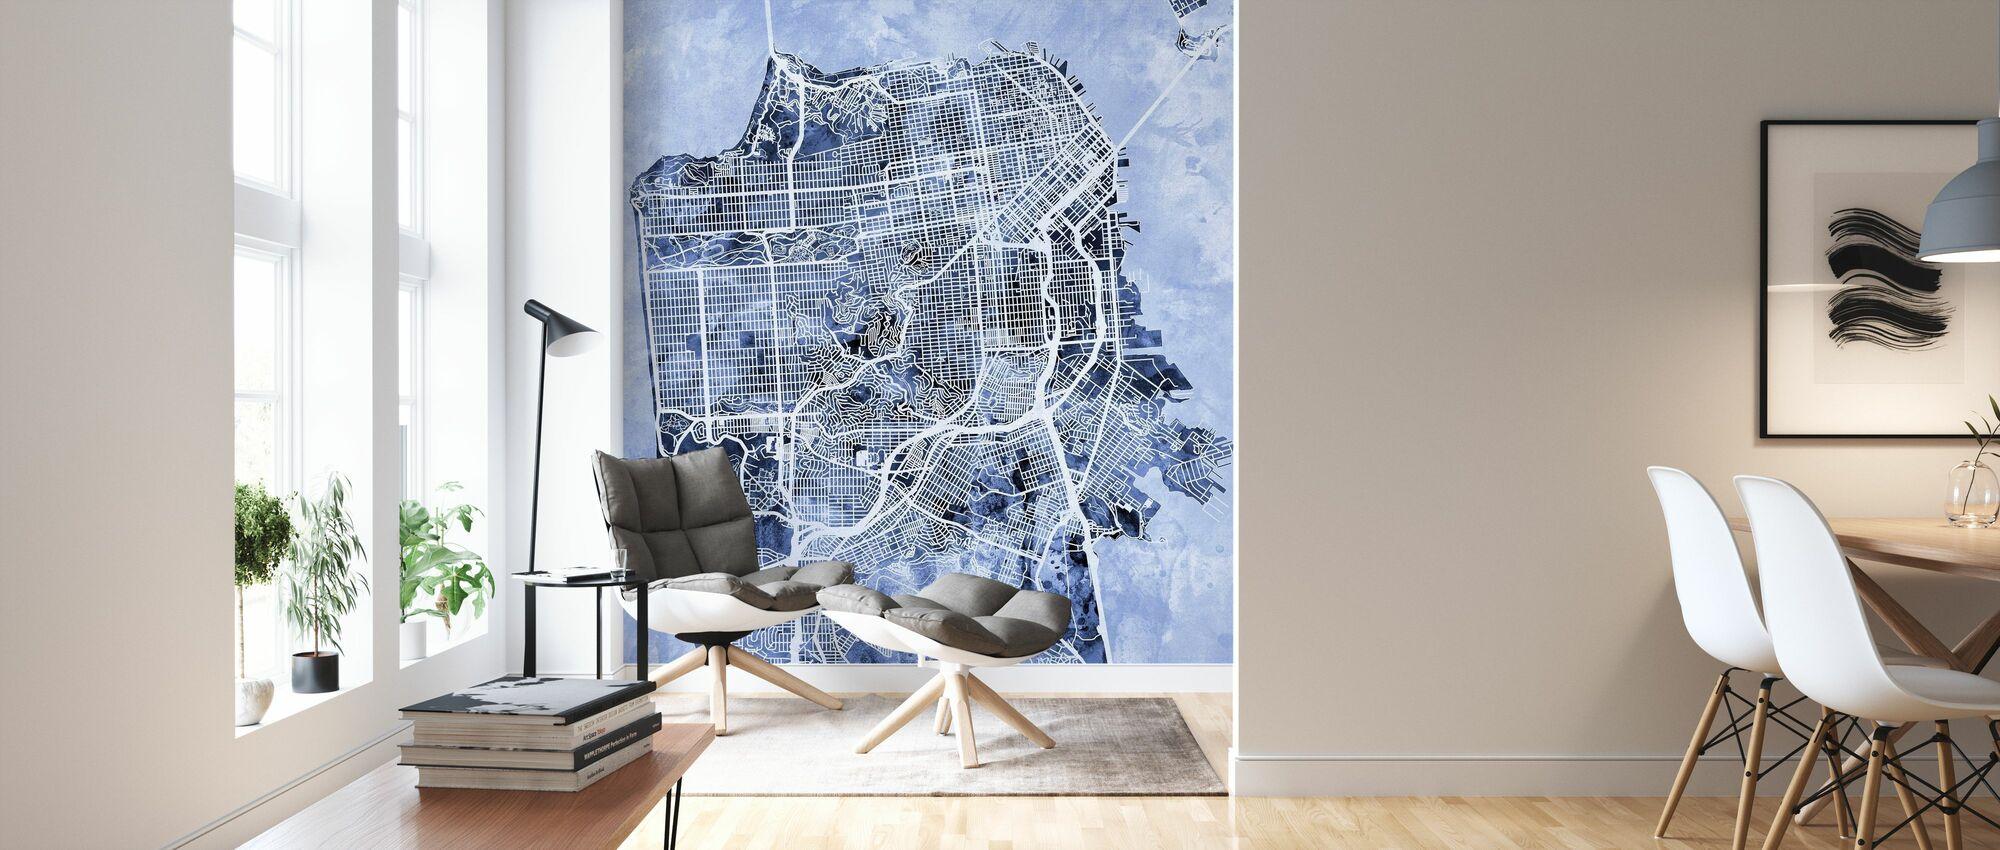 San Francisco City Street Map - Wallpaper - Living Room